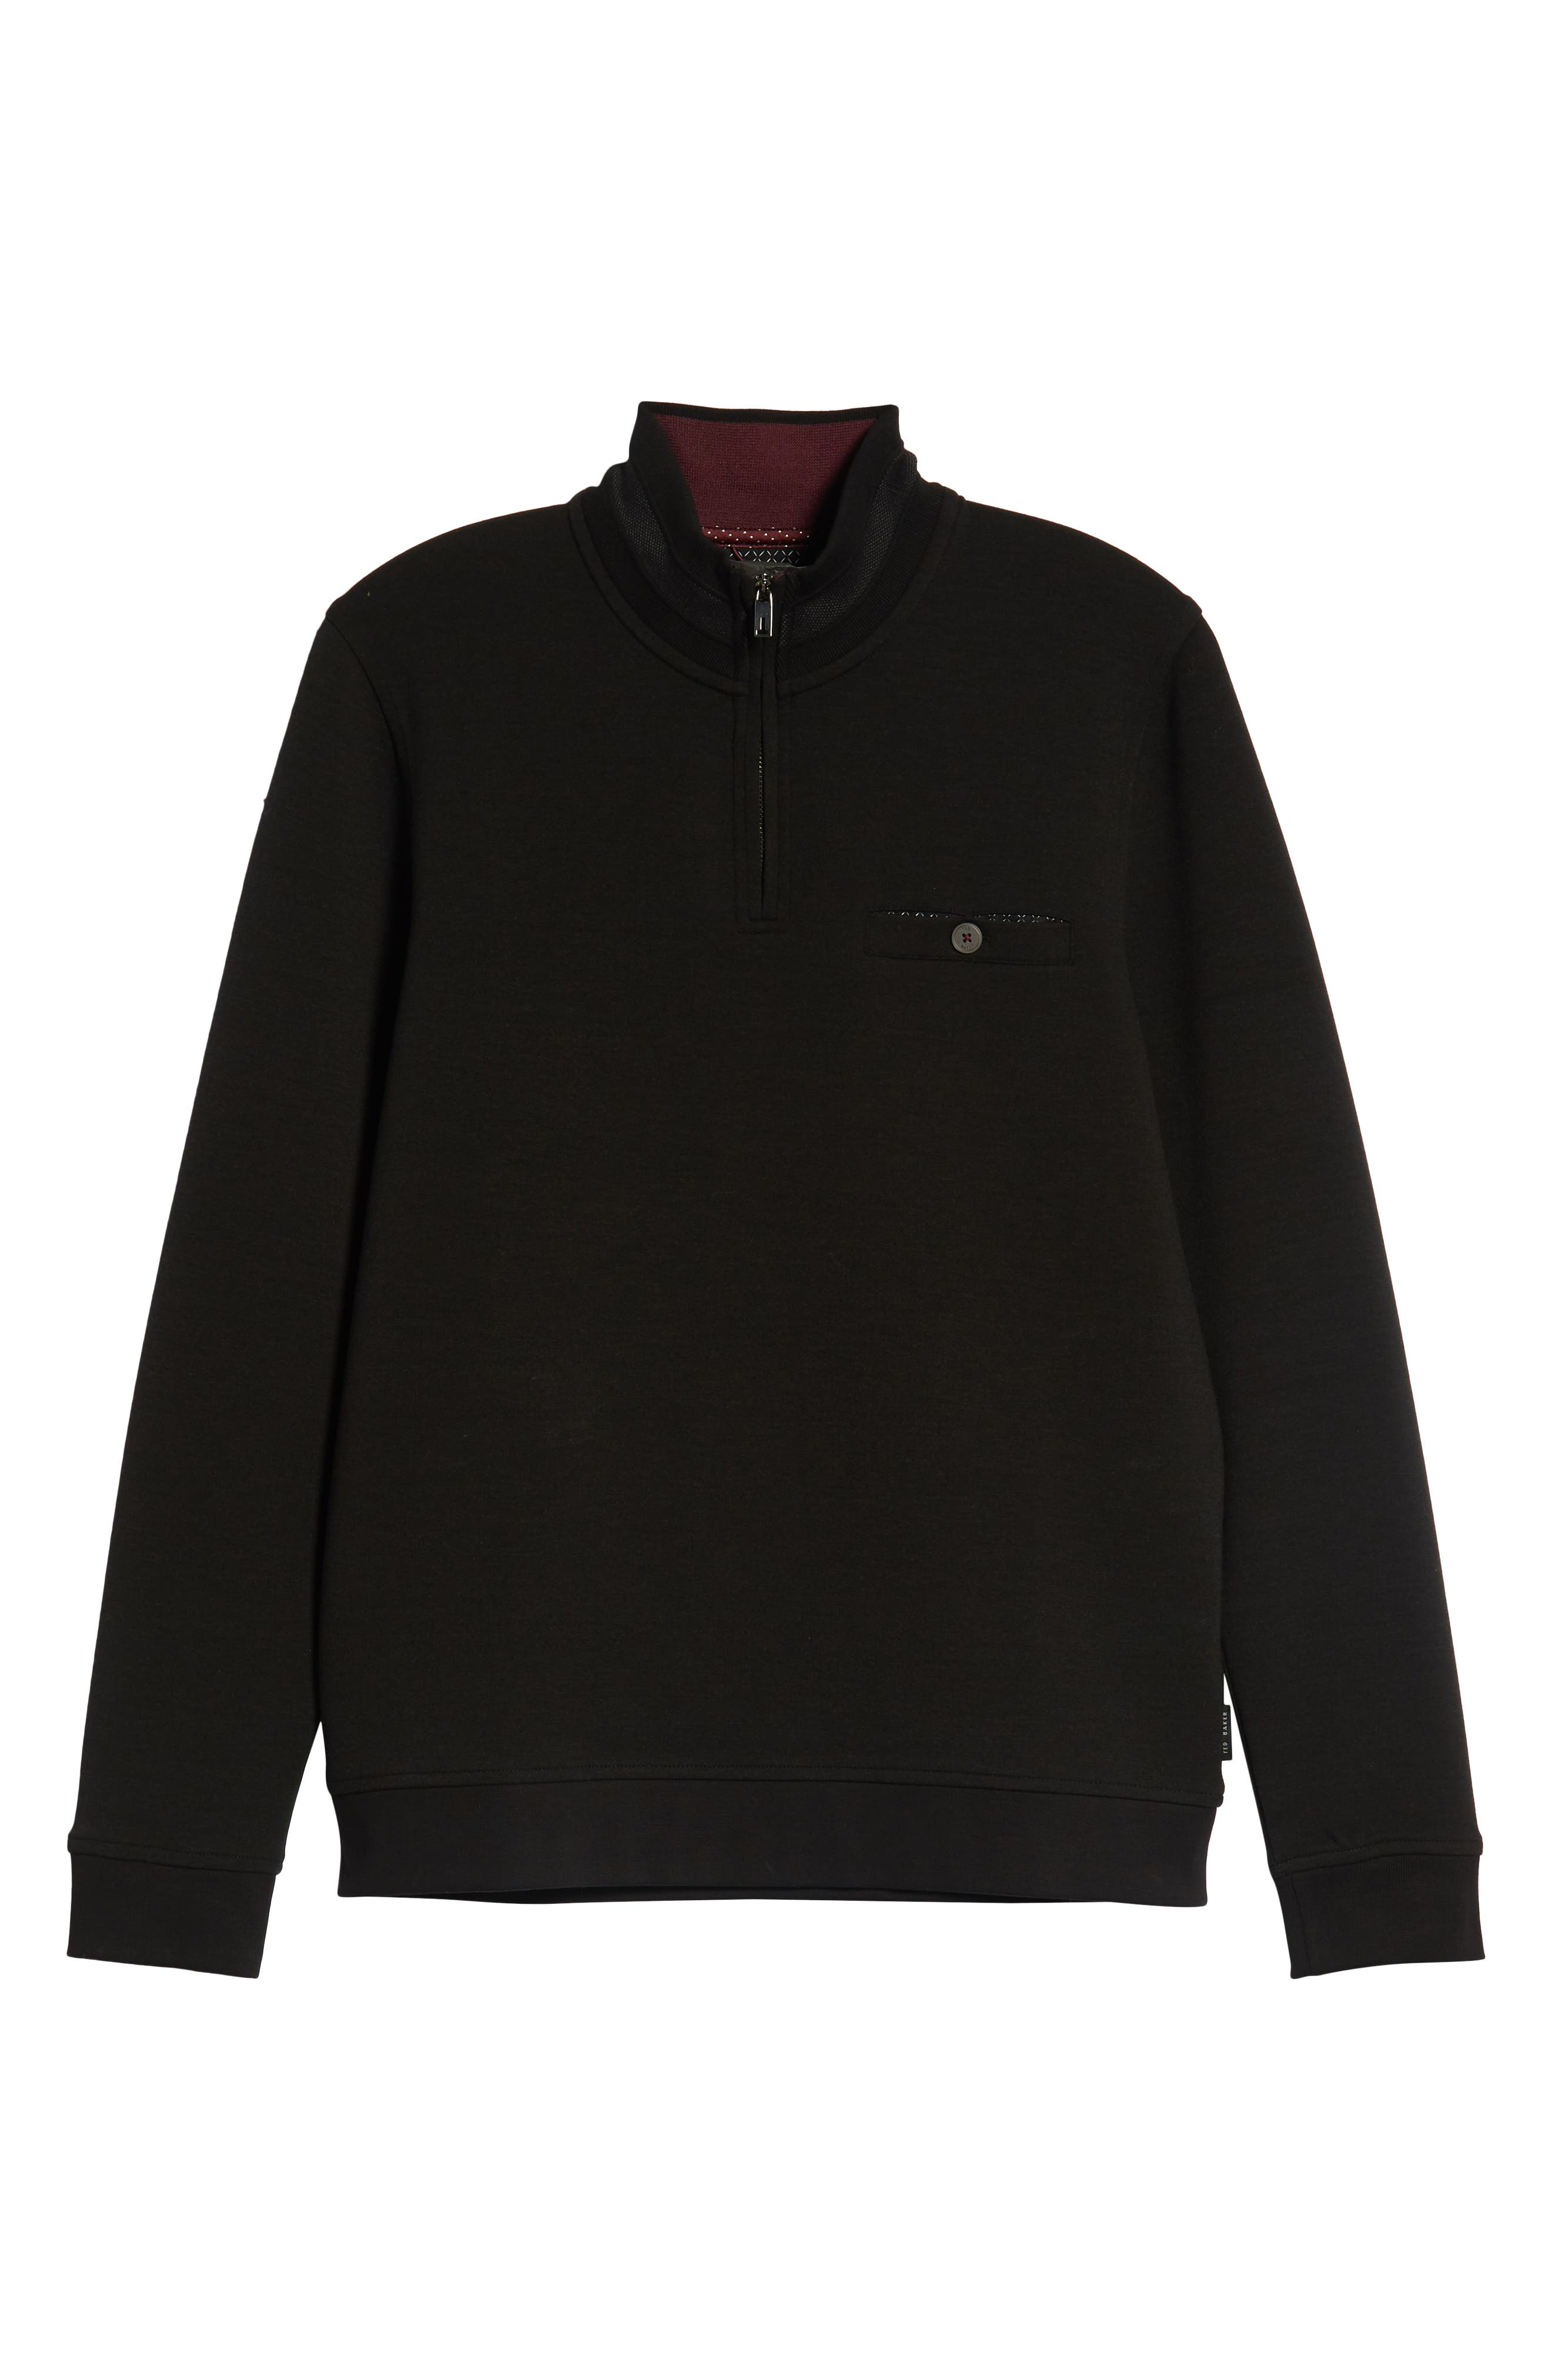 Peper Trim Fit Half Zip Pullover,                             Alternate thumbnail 6, color,                             001